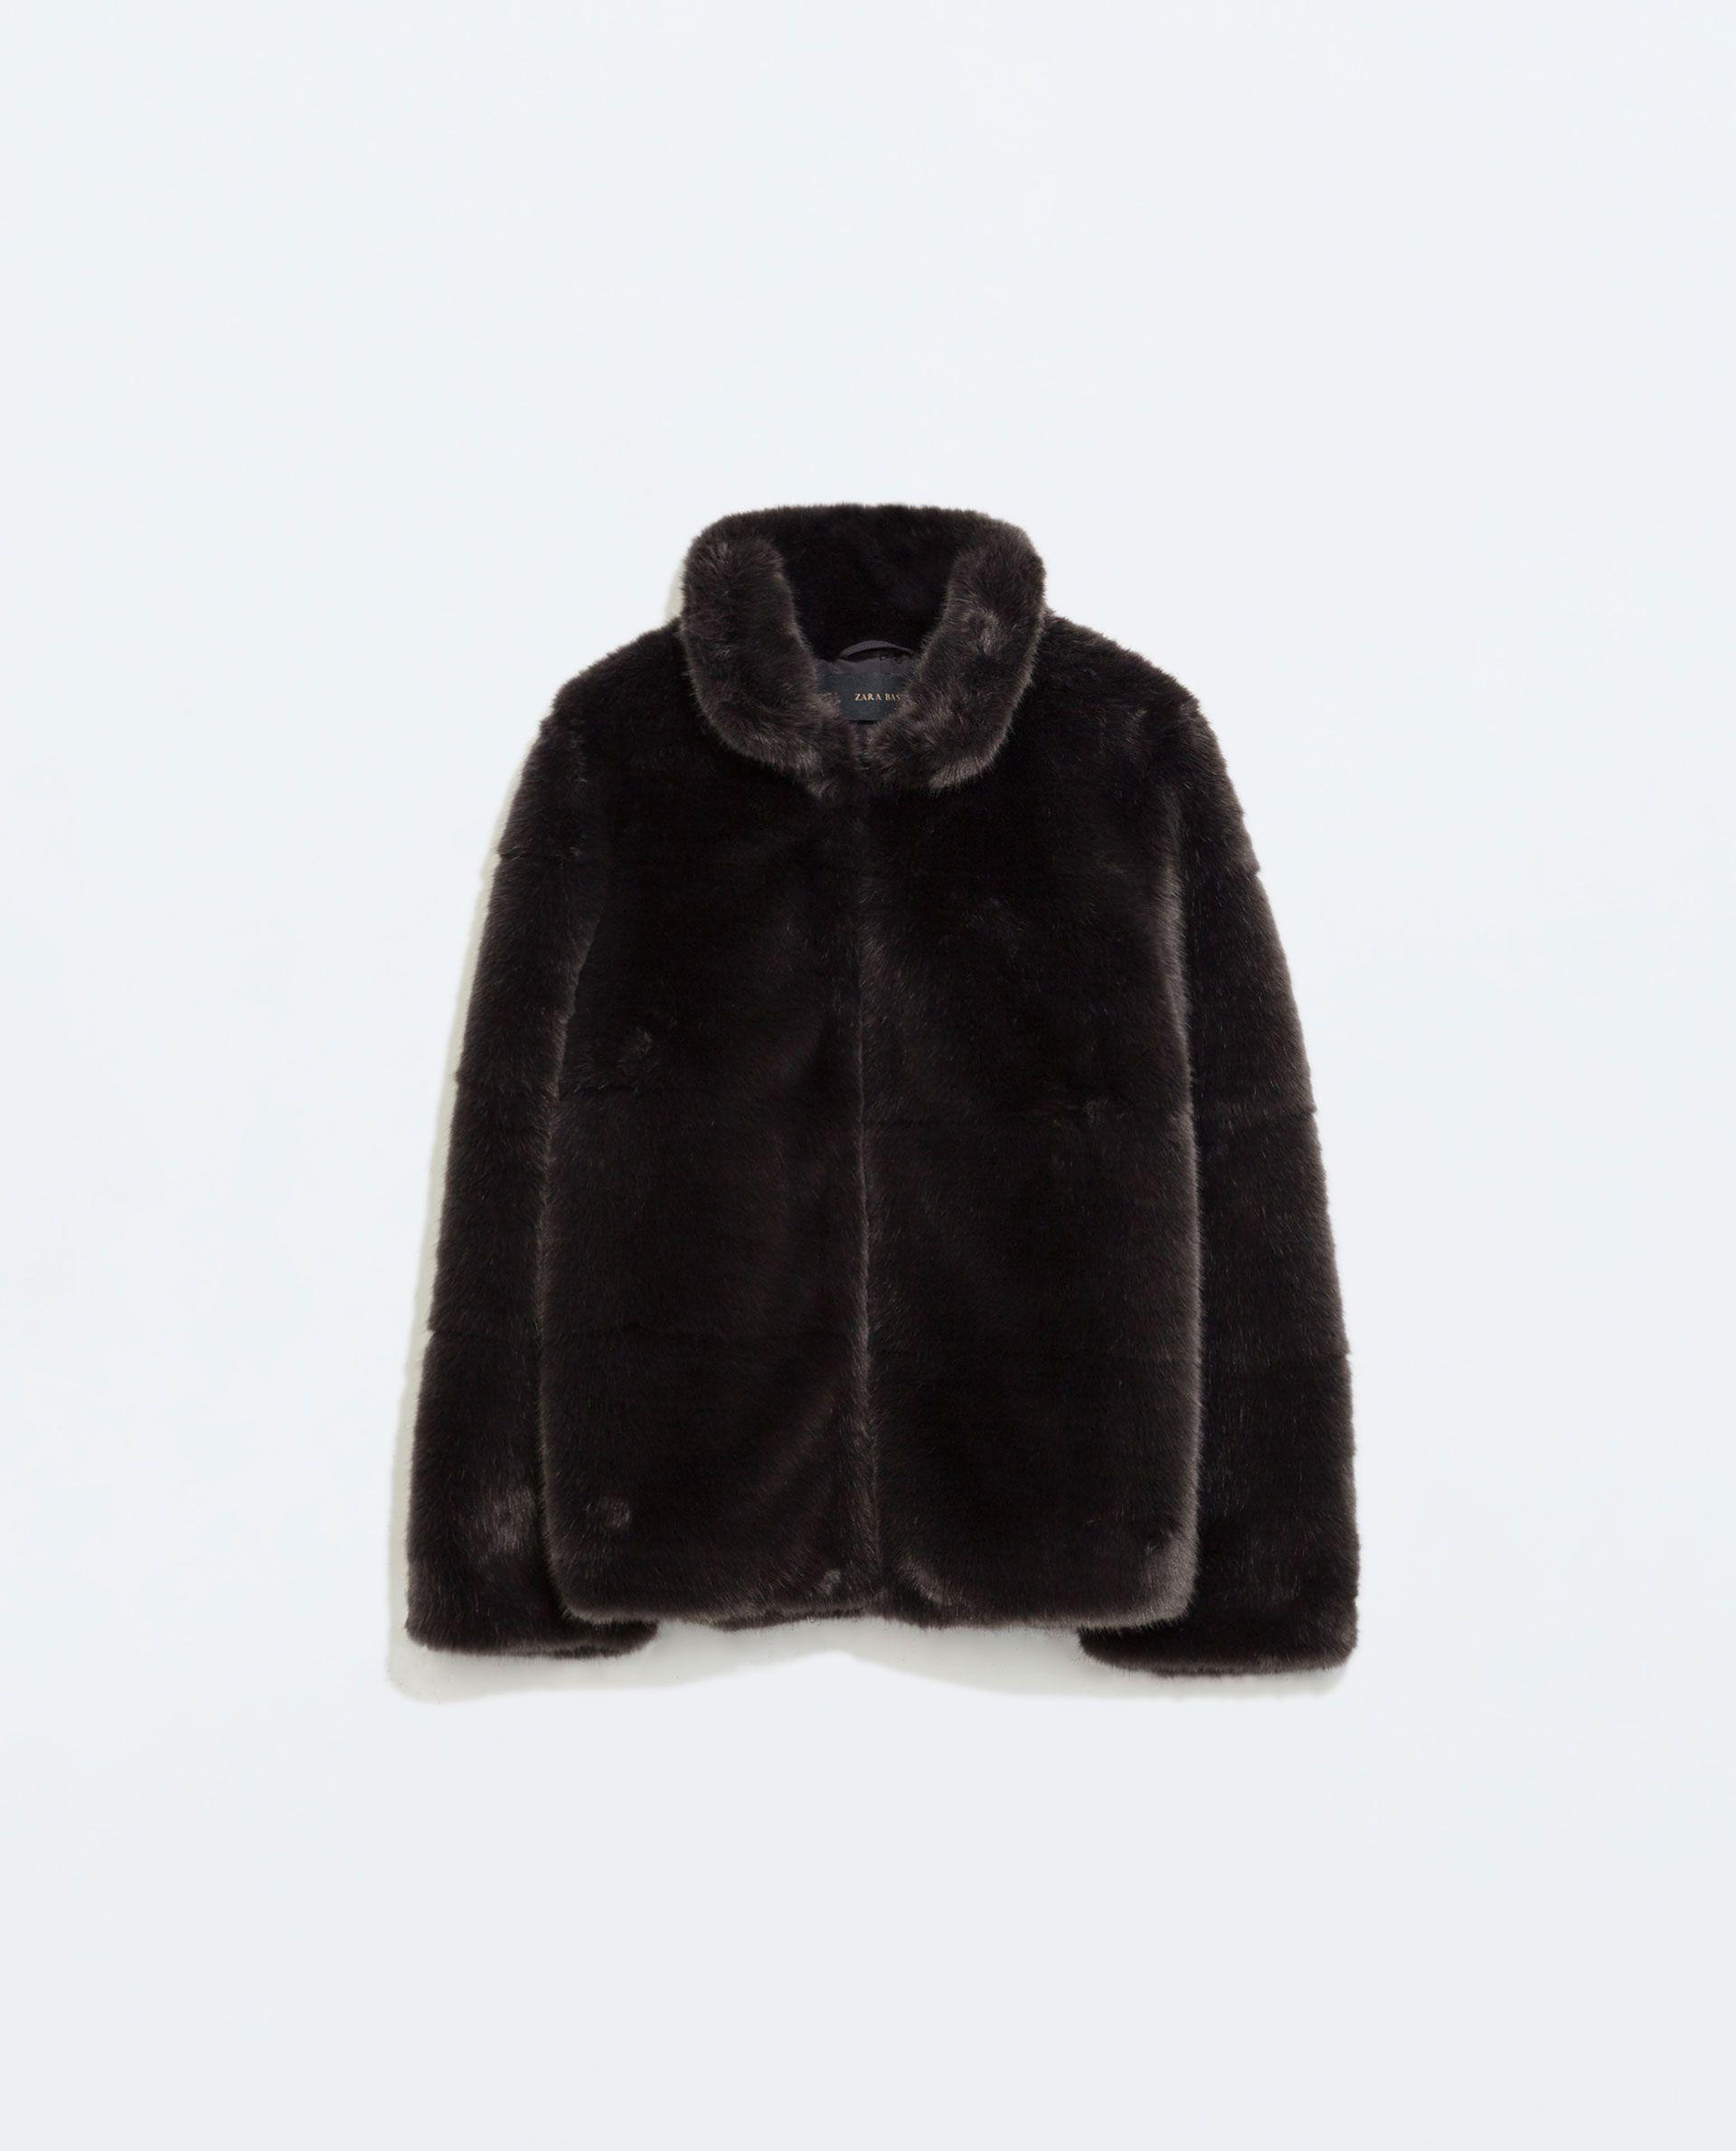 5 Buys: Fur Vests recommend